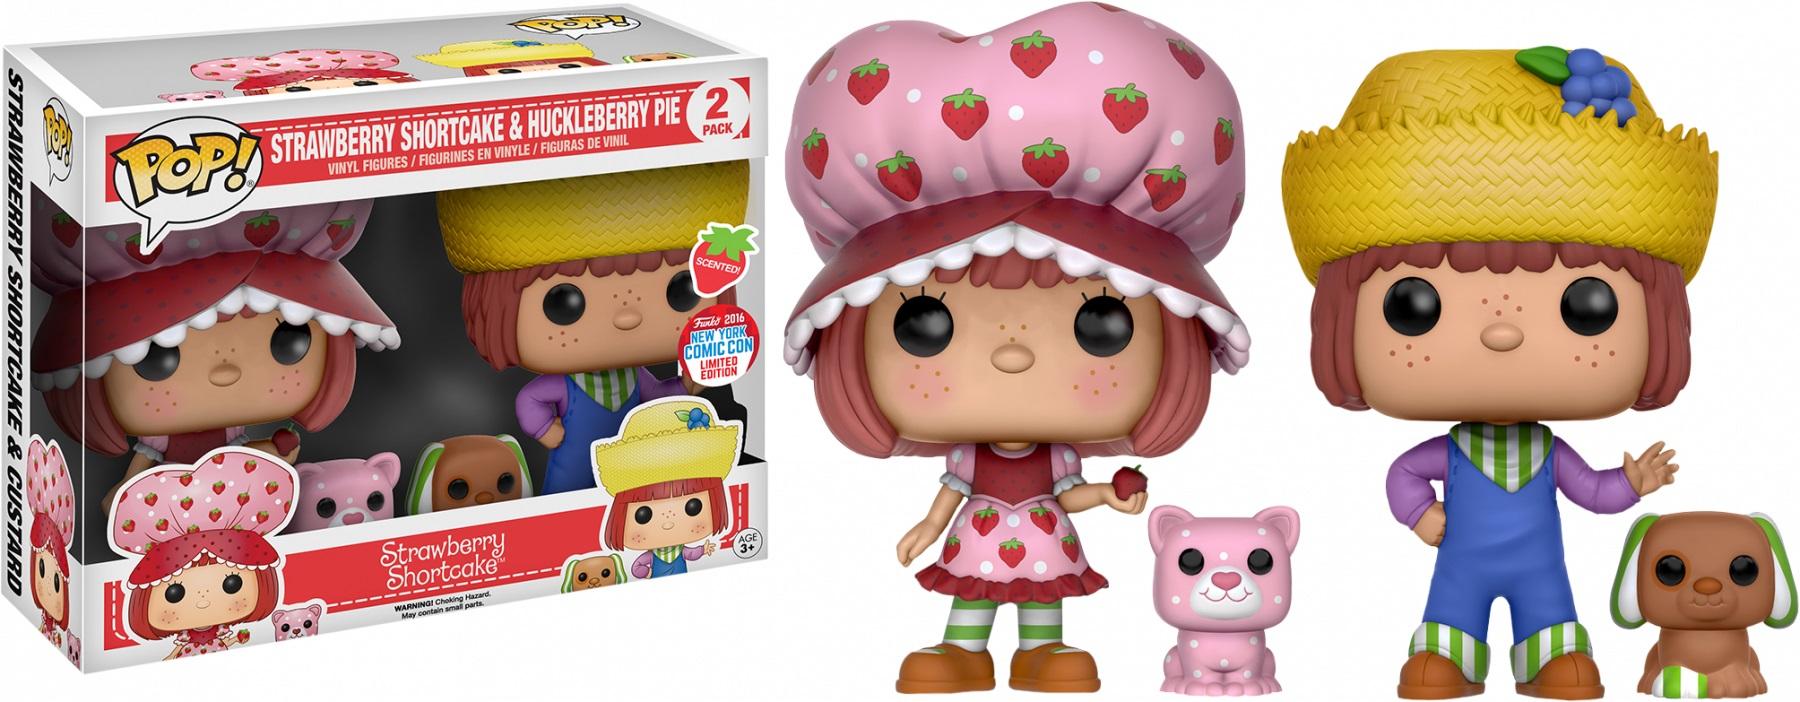 Strawberry Shortcake POP! Vinyl Figures 2-Pack Strawberry Shortcake & Huckleberry Pie 9 cm (con bollino NYCC 2016)